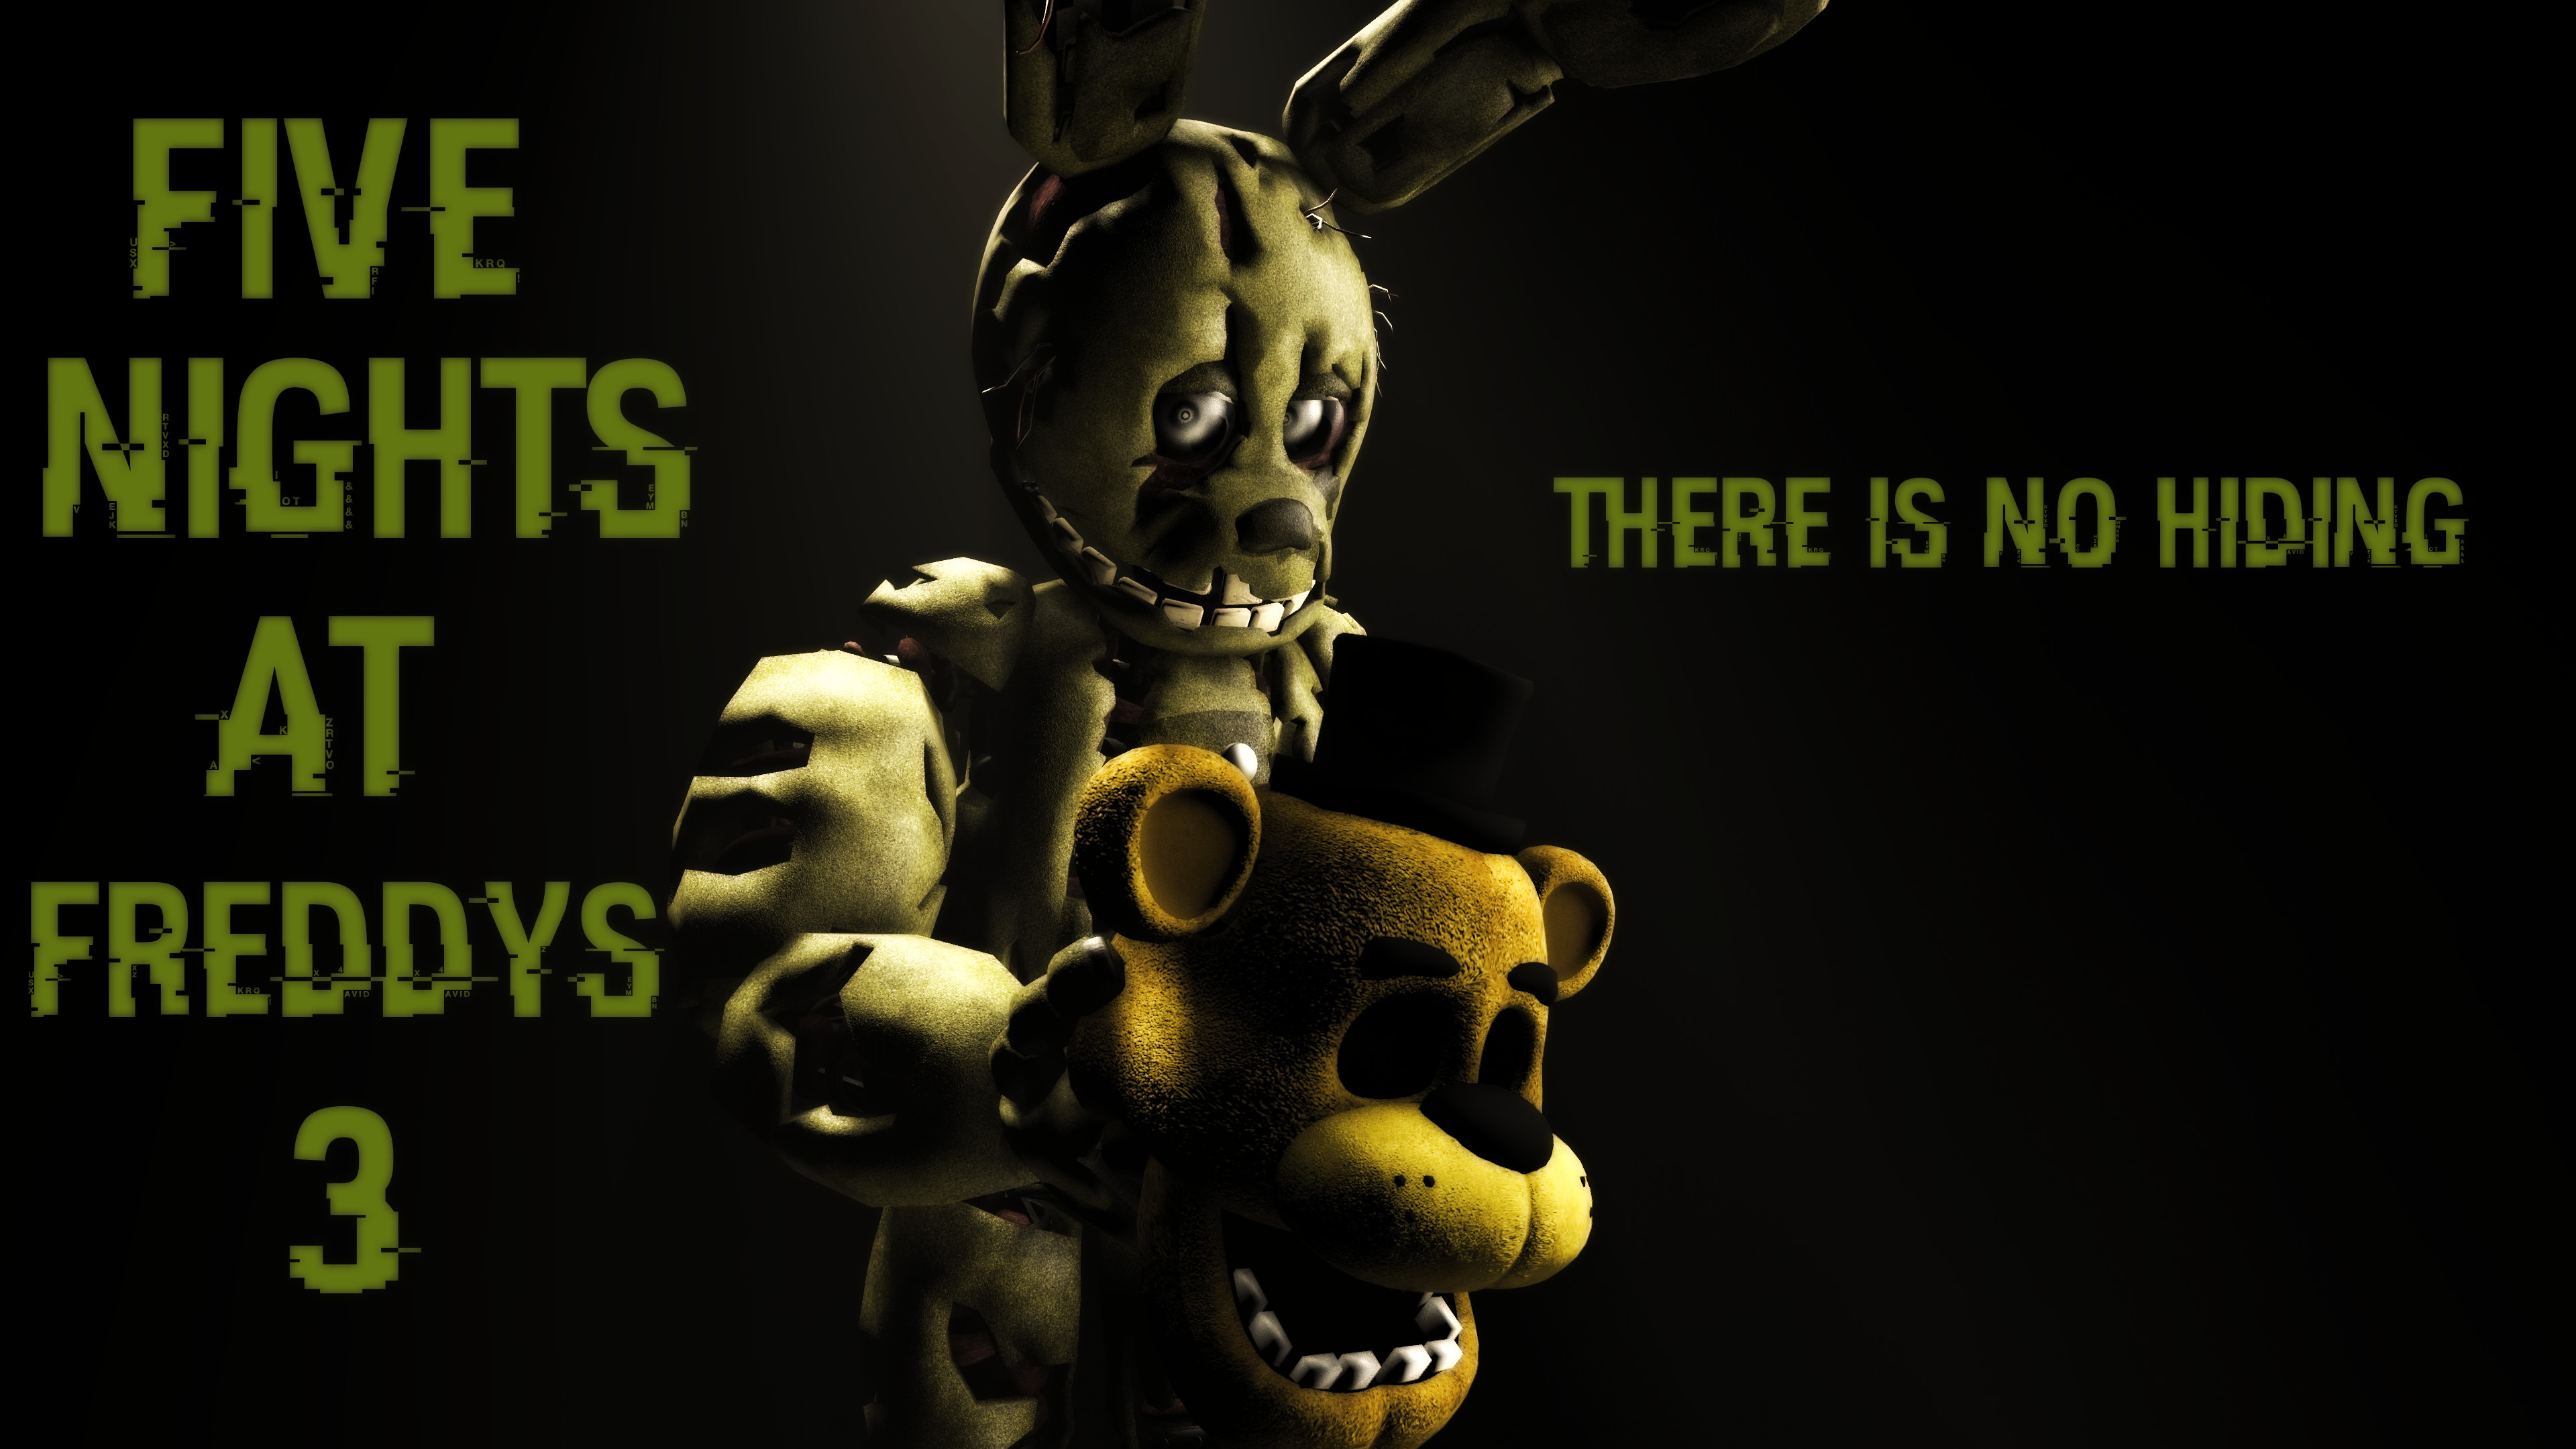 … Five Nights At Freddy's 3 Wallpaper by boatfullogoats